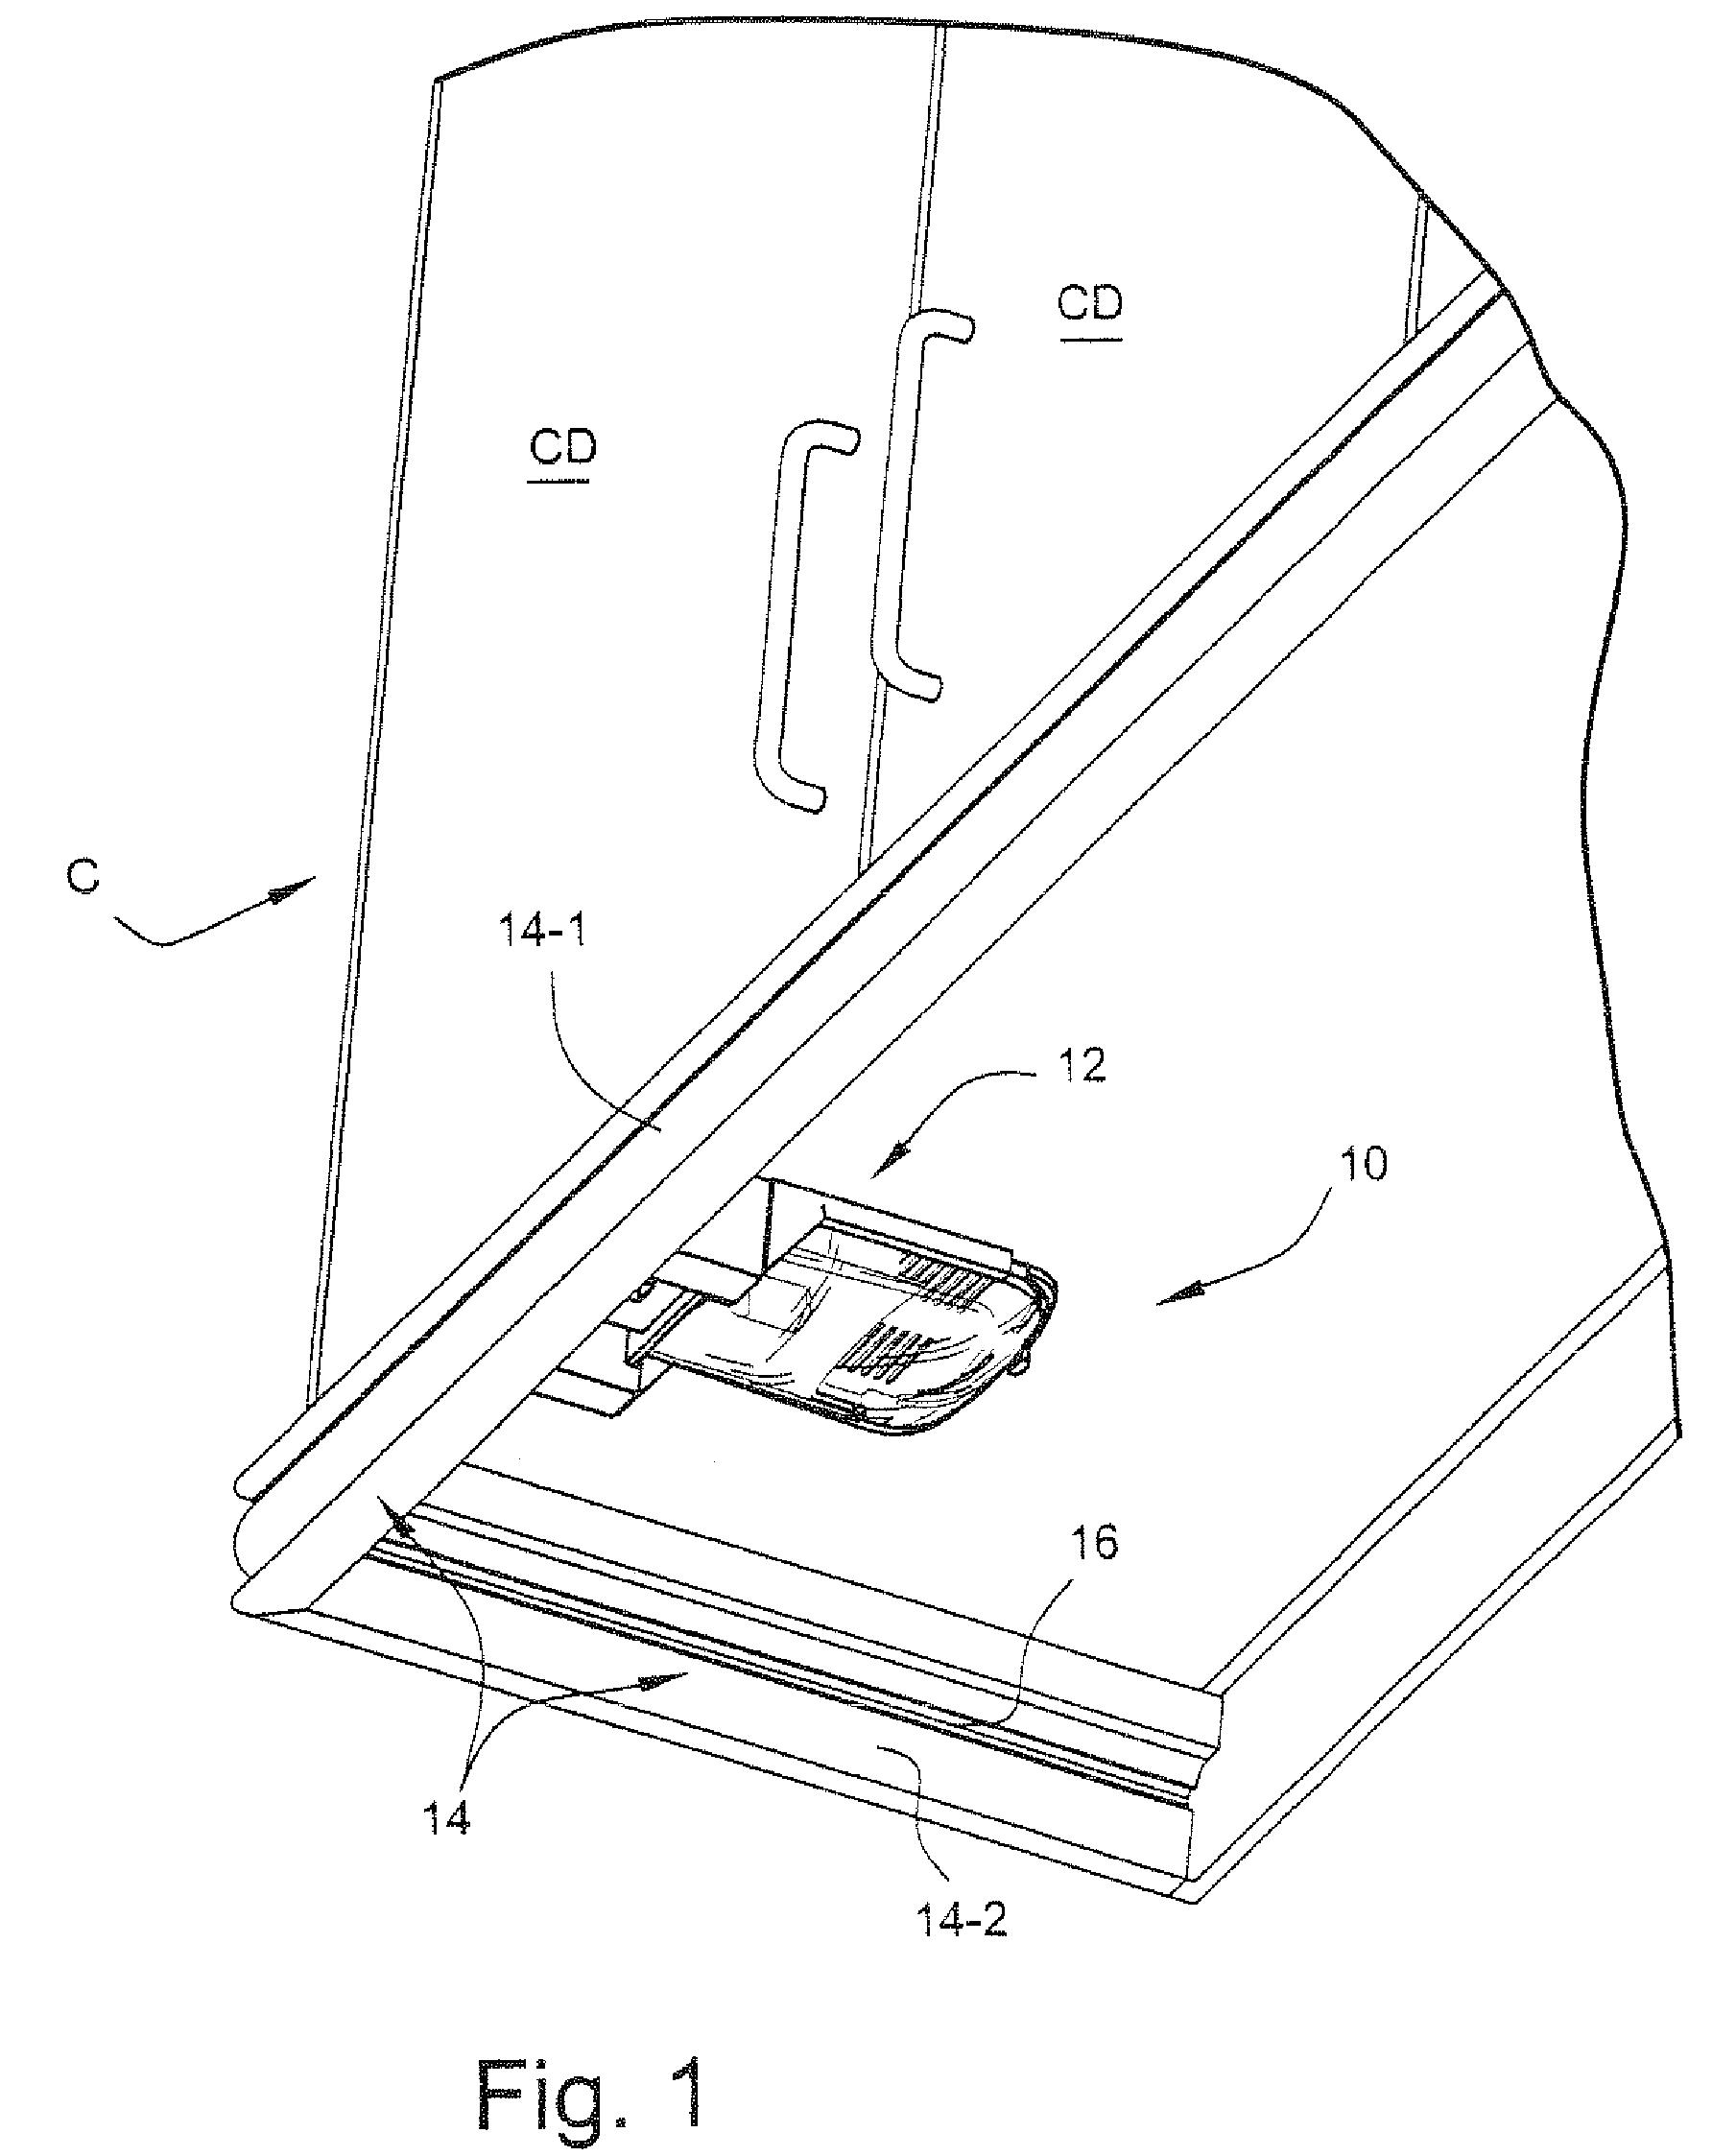 Diabolical Circuit Bent Casio Sk1 Custom Modular